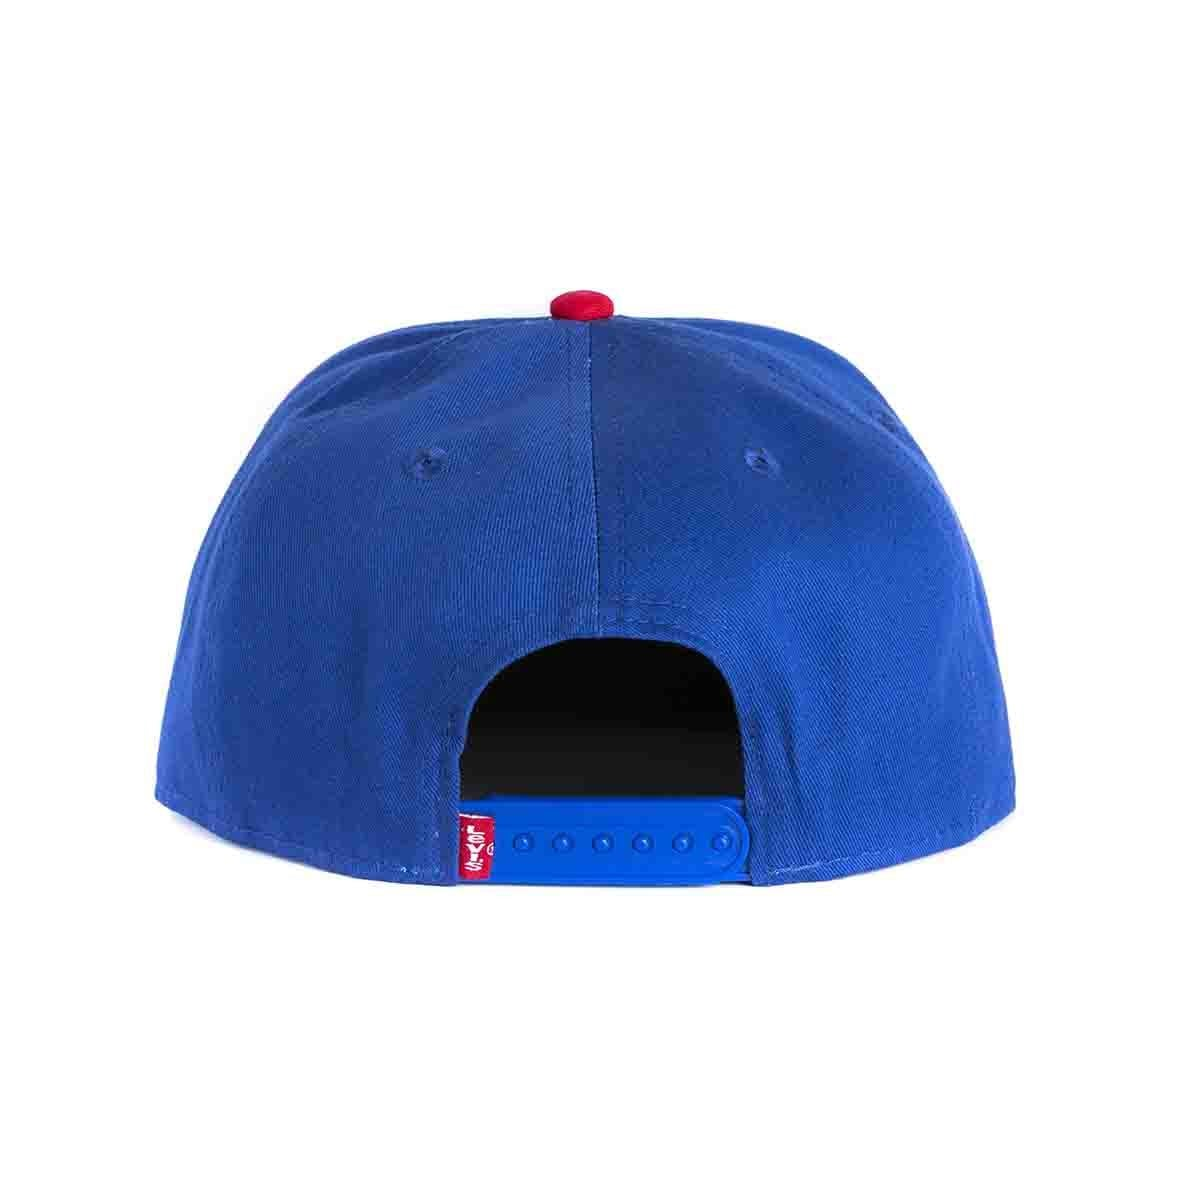 Gorra Color Azul Combinado Levi's